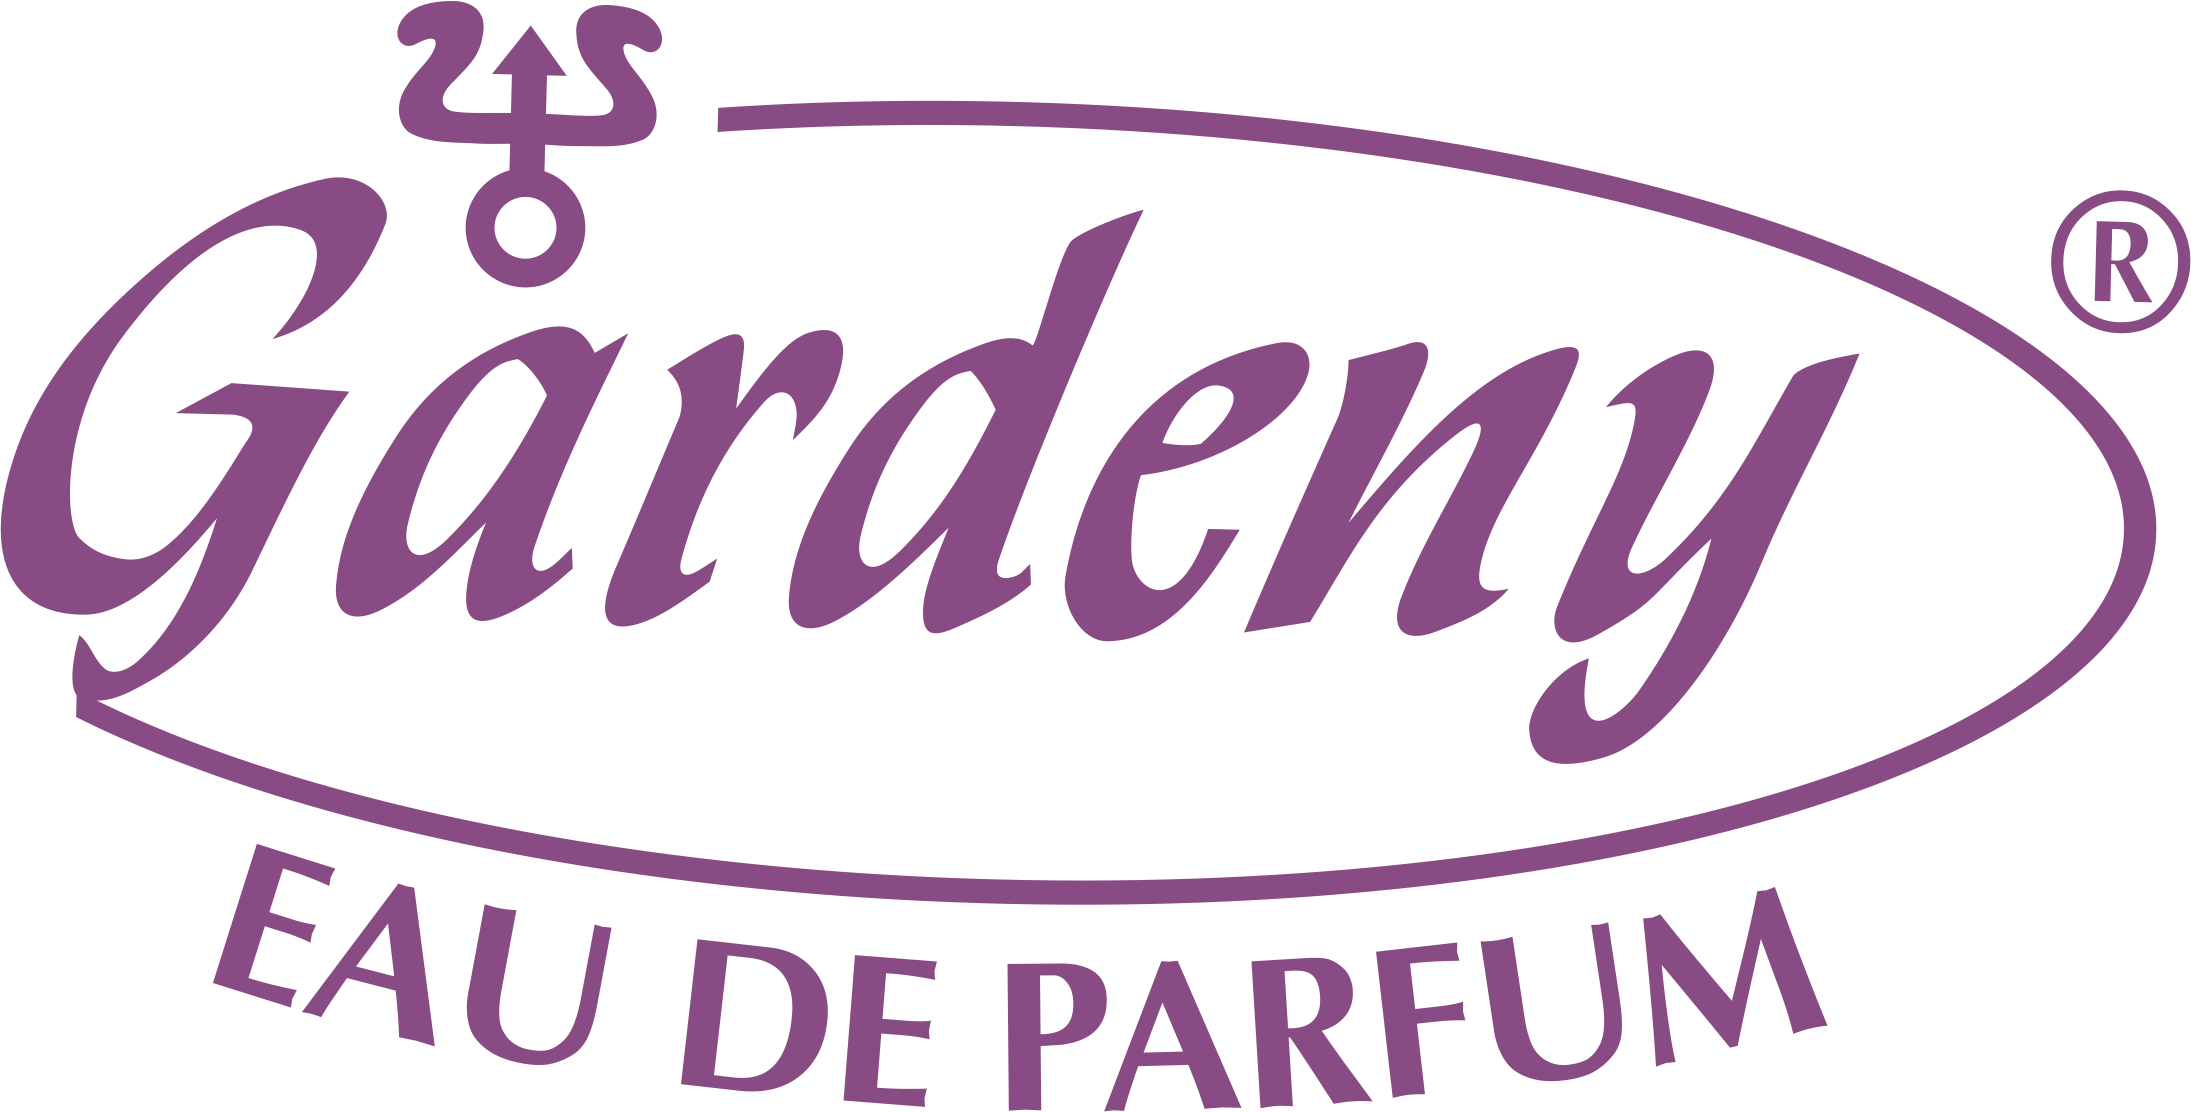 Gardeny